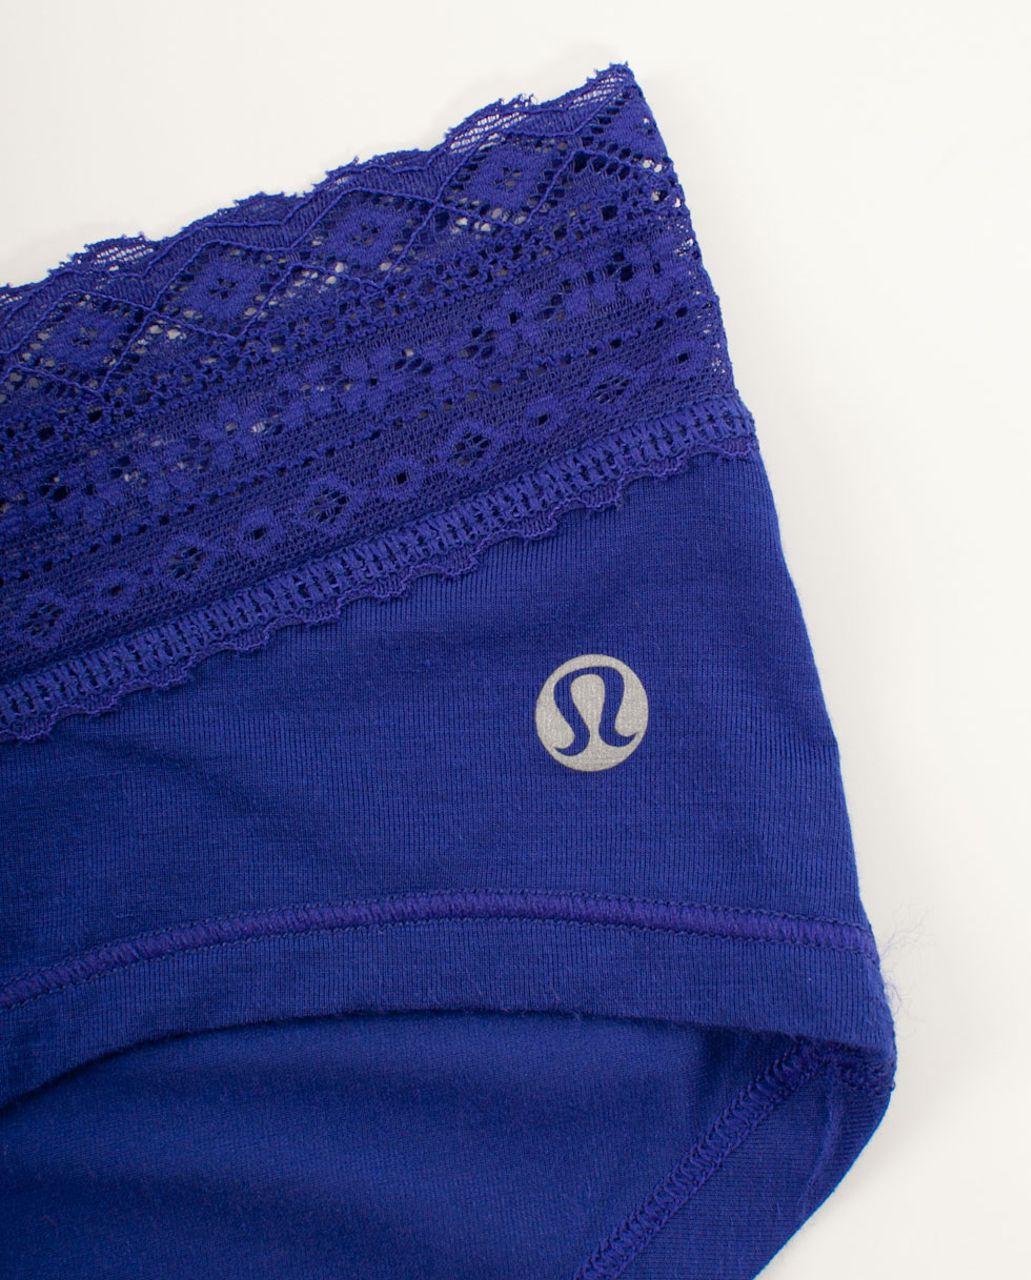 Lululemon Foxy Lulu Hotshort - Pigment Blue